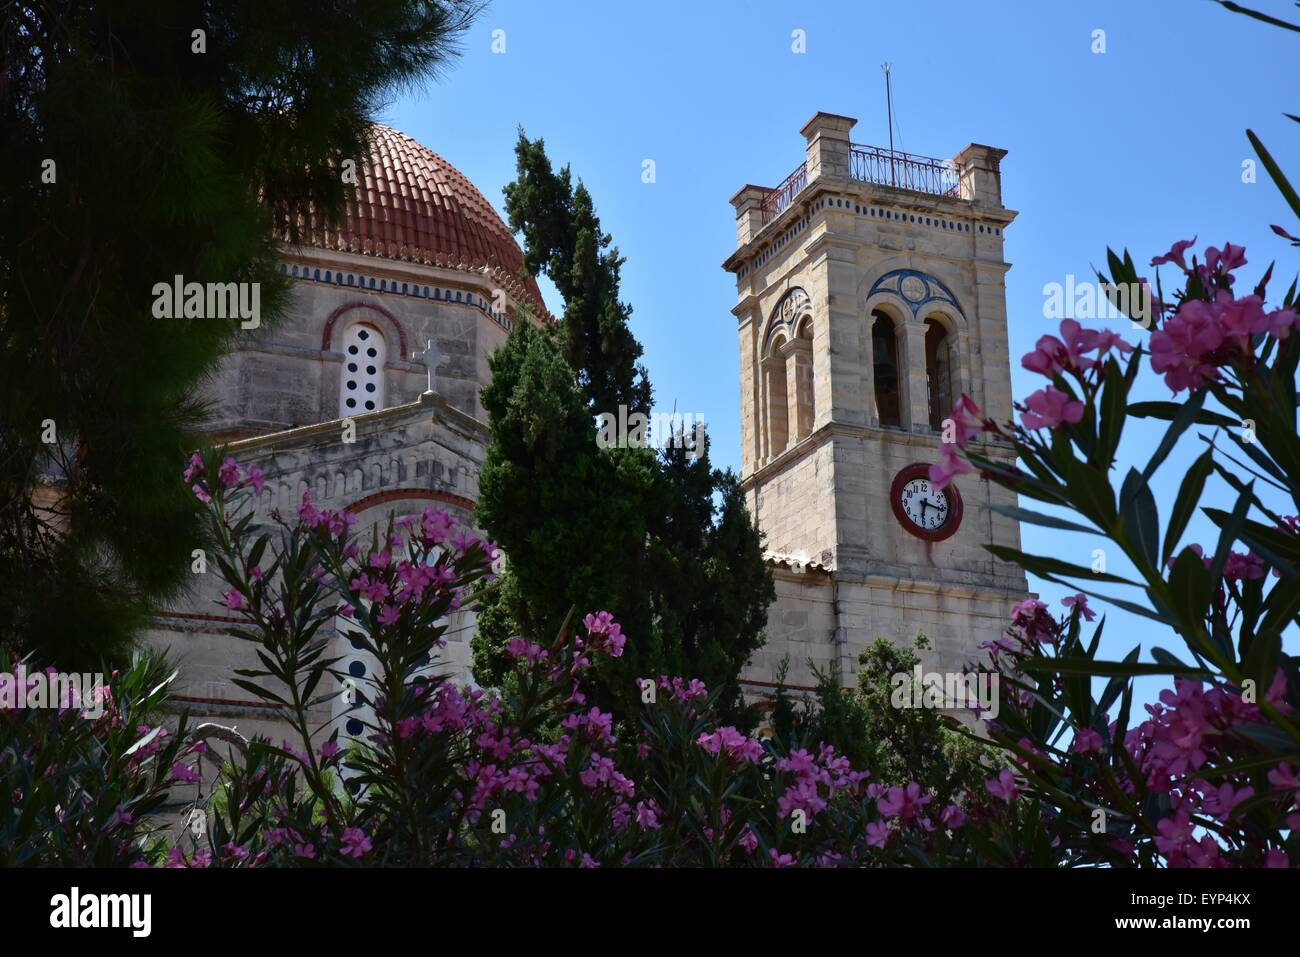 Church bell tower on Aegina island Greece - Stock Image